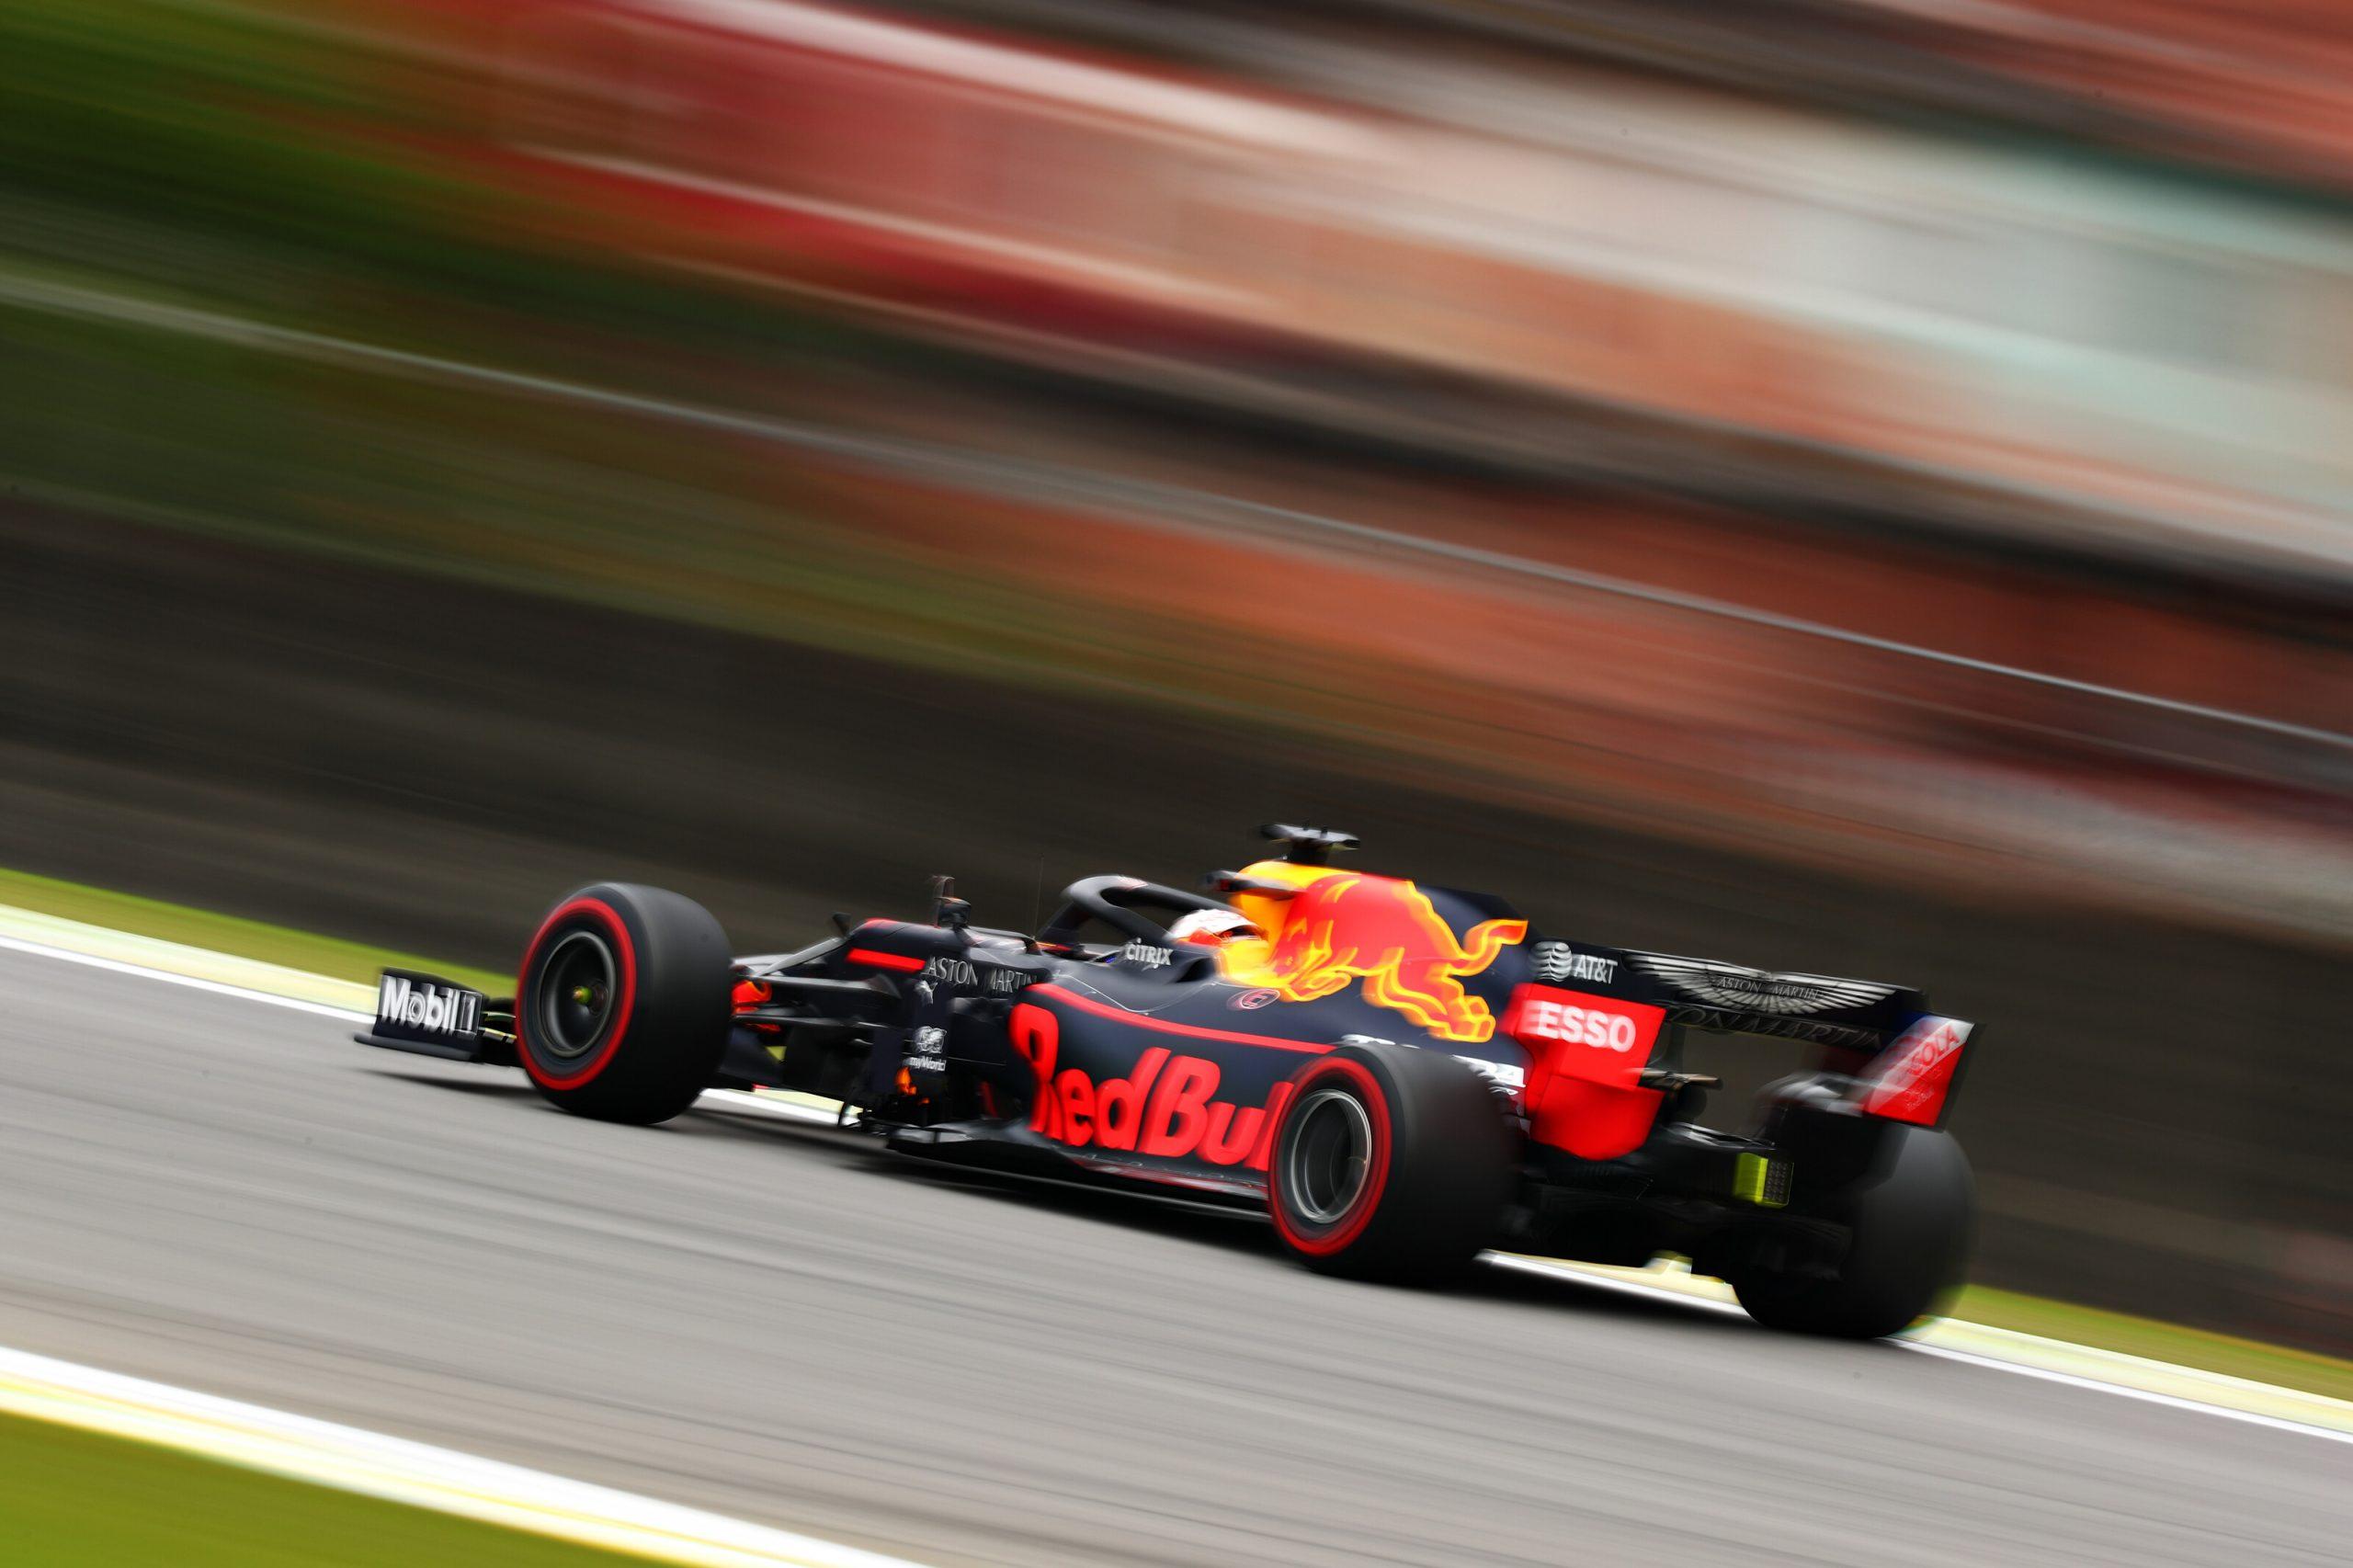 safety car pierre gasly F1 Formula 1 Formula One Brazilian Grand Prix Verstappen